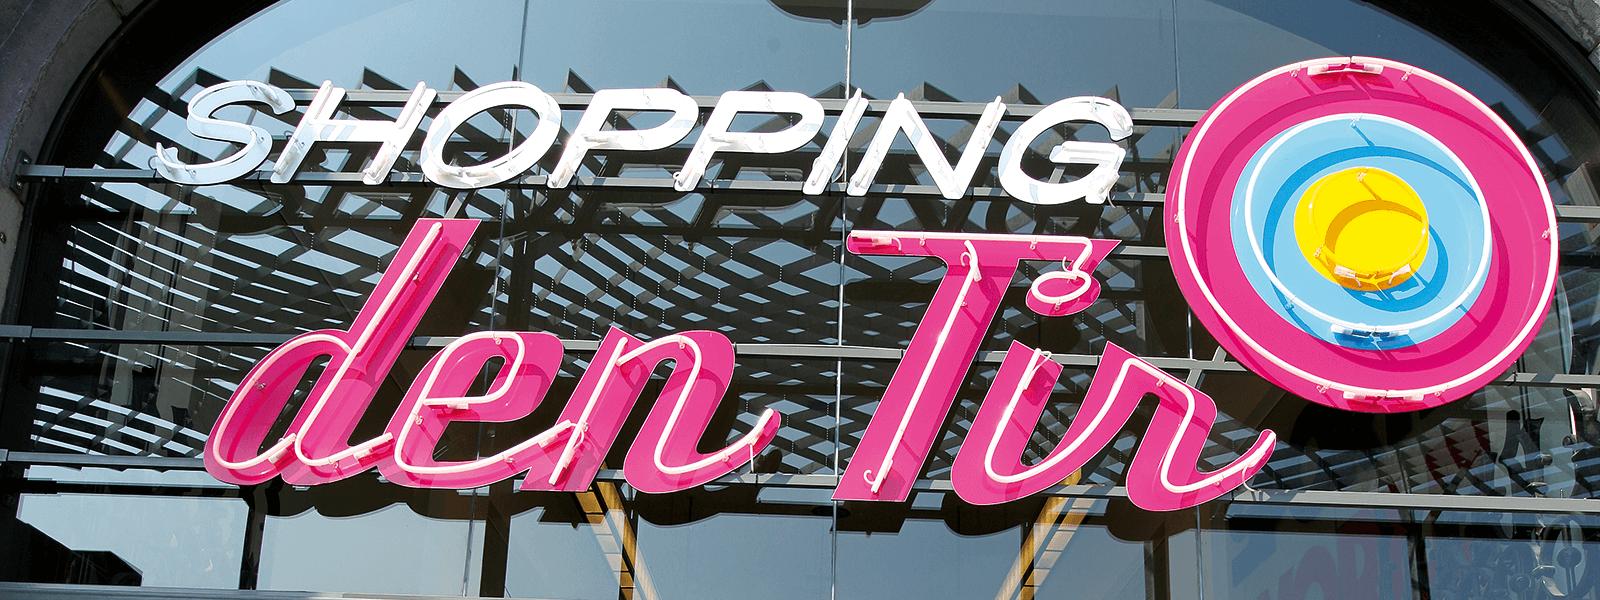 Shopping Den Tir algemeen beeld